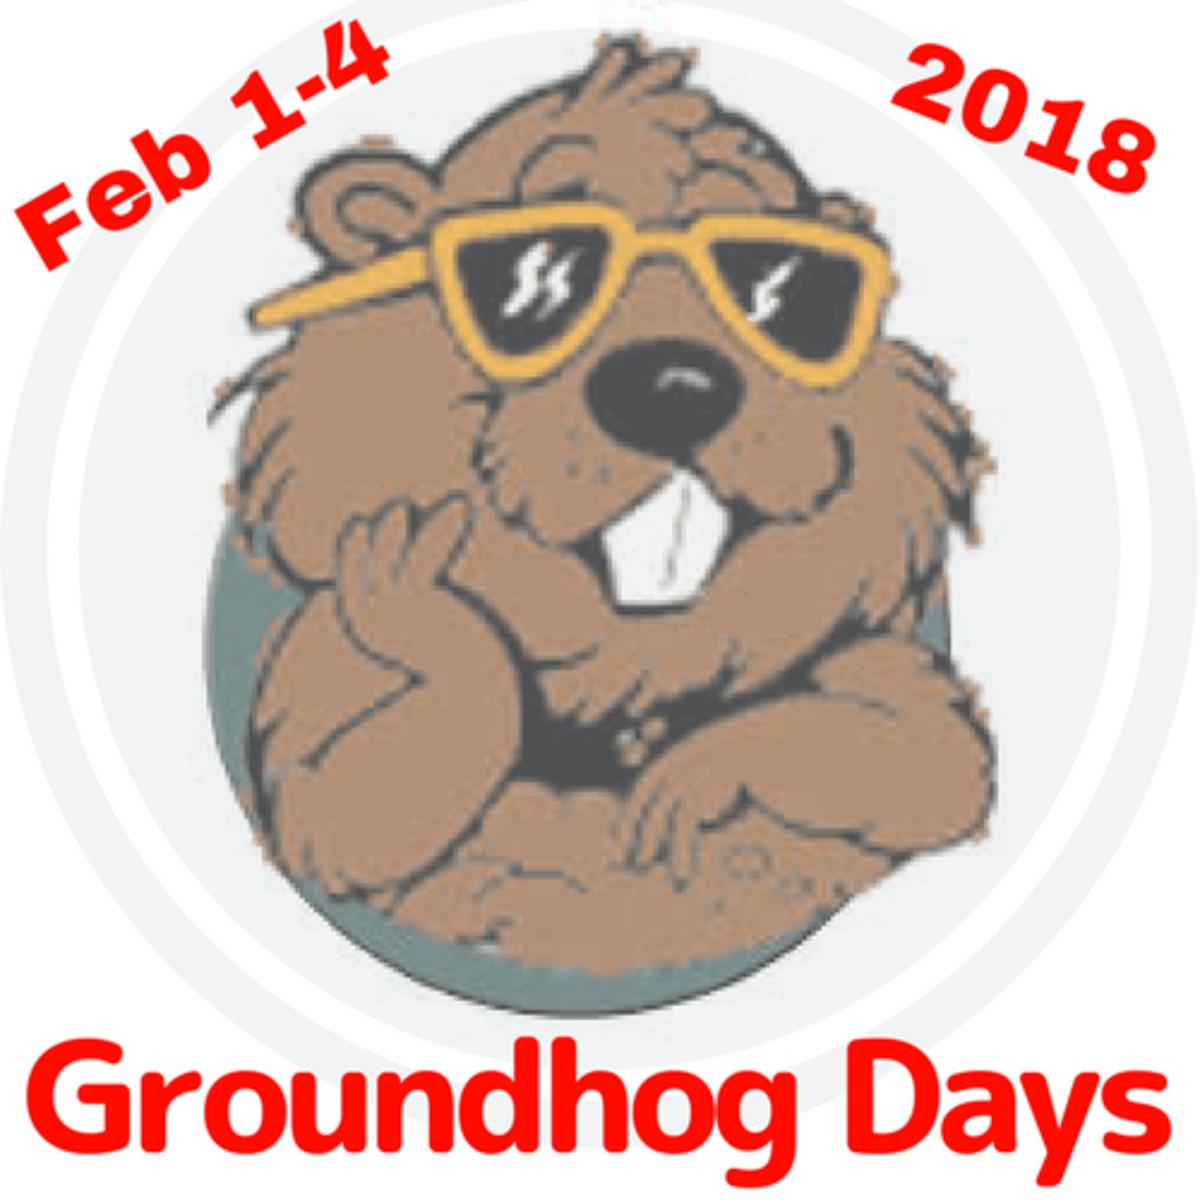 Groundhog Days Events February 1-4, 2018